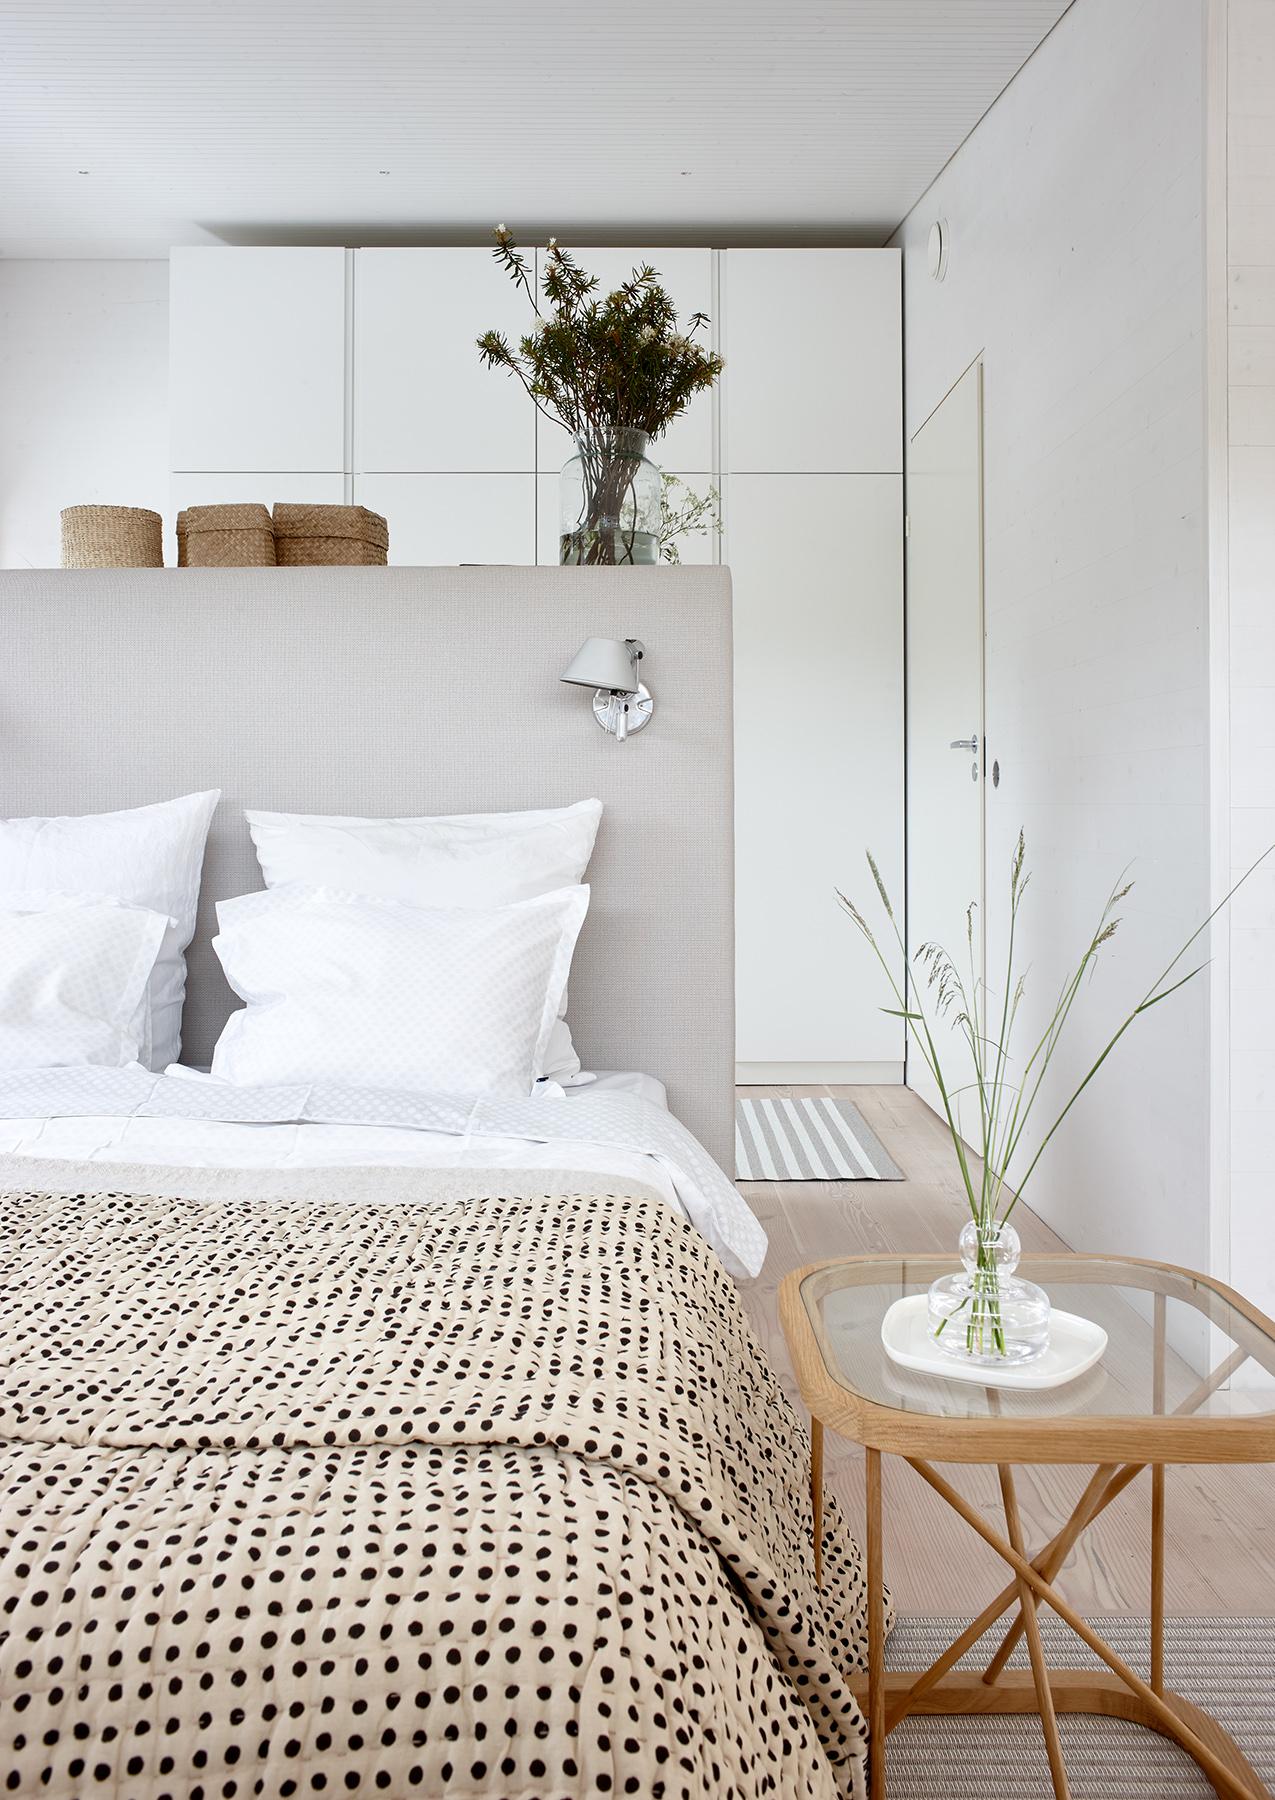 47001C Woodnotes Bed headboard stone-white, 46700W  Twiggy  oak bed side table size 44x44x45,5 cm.